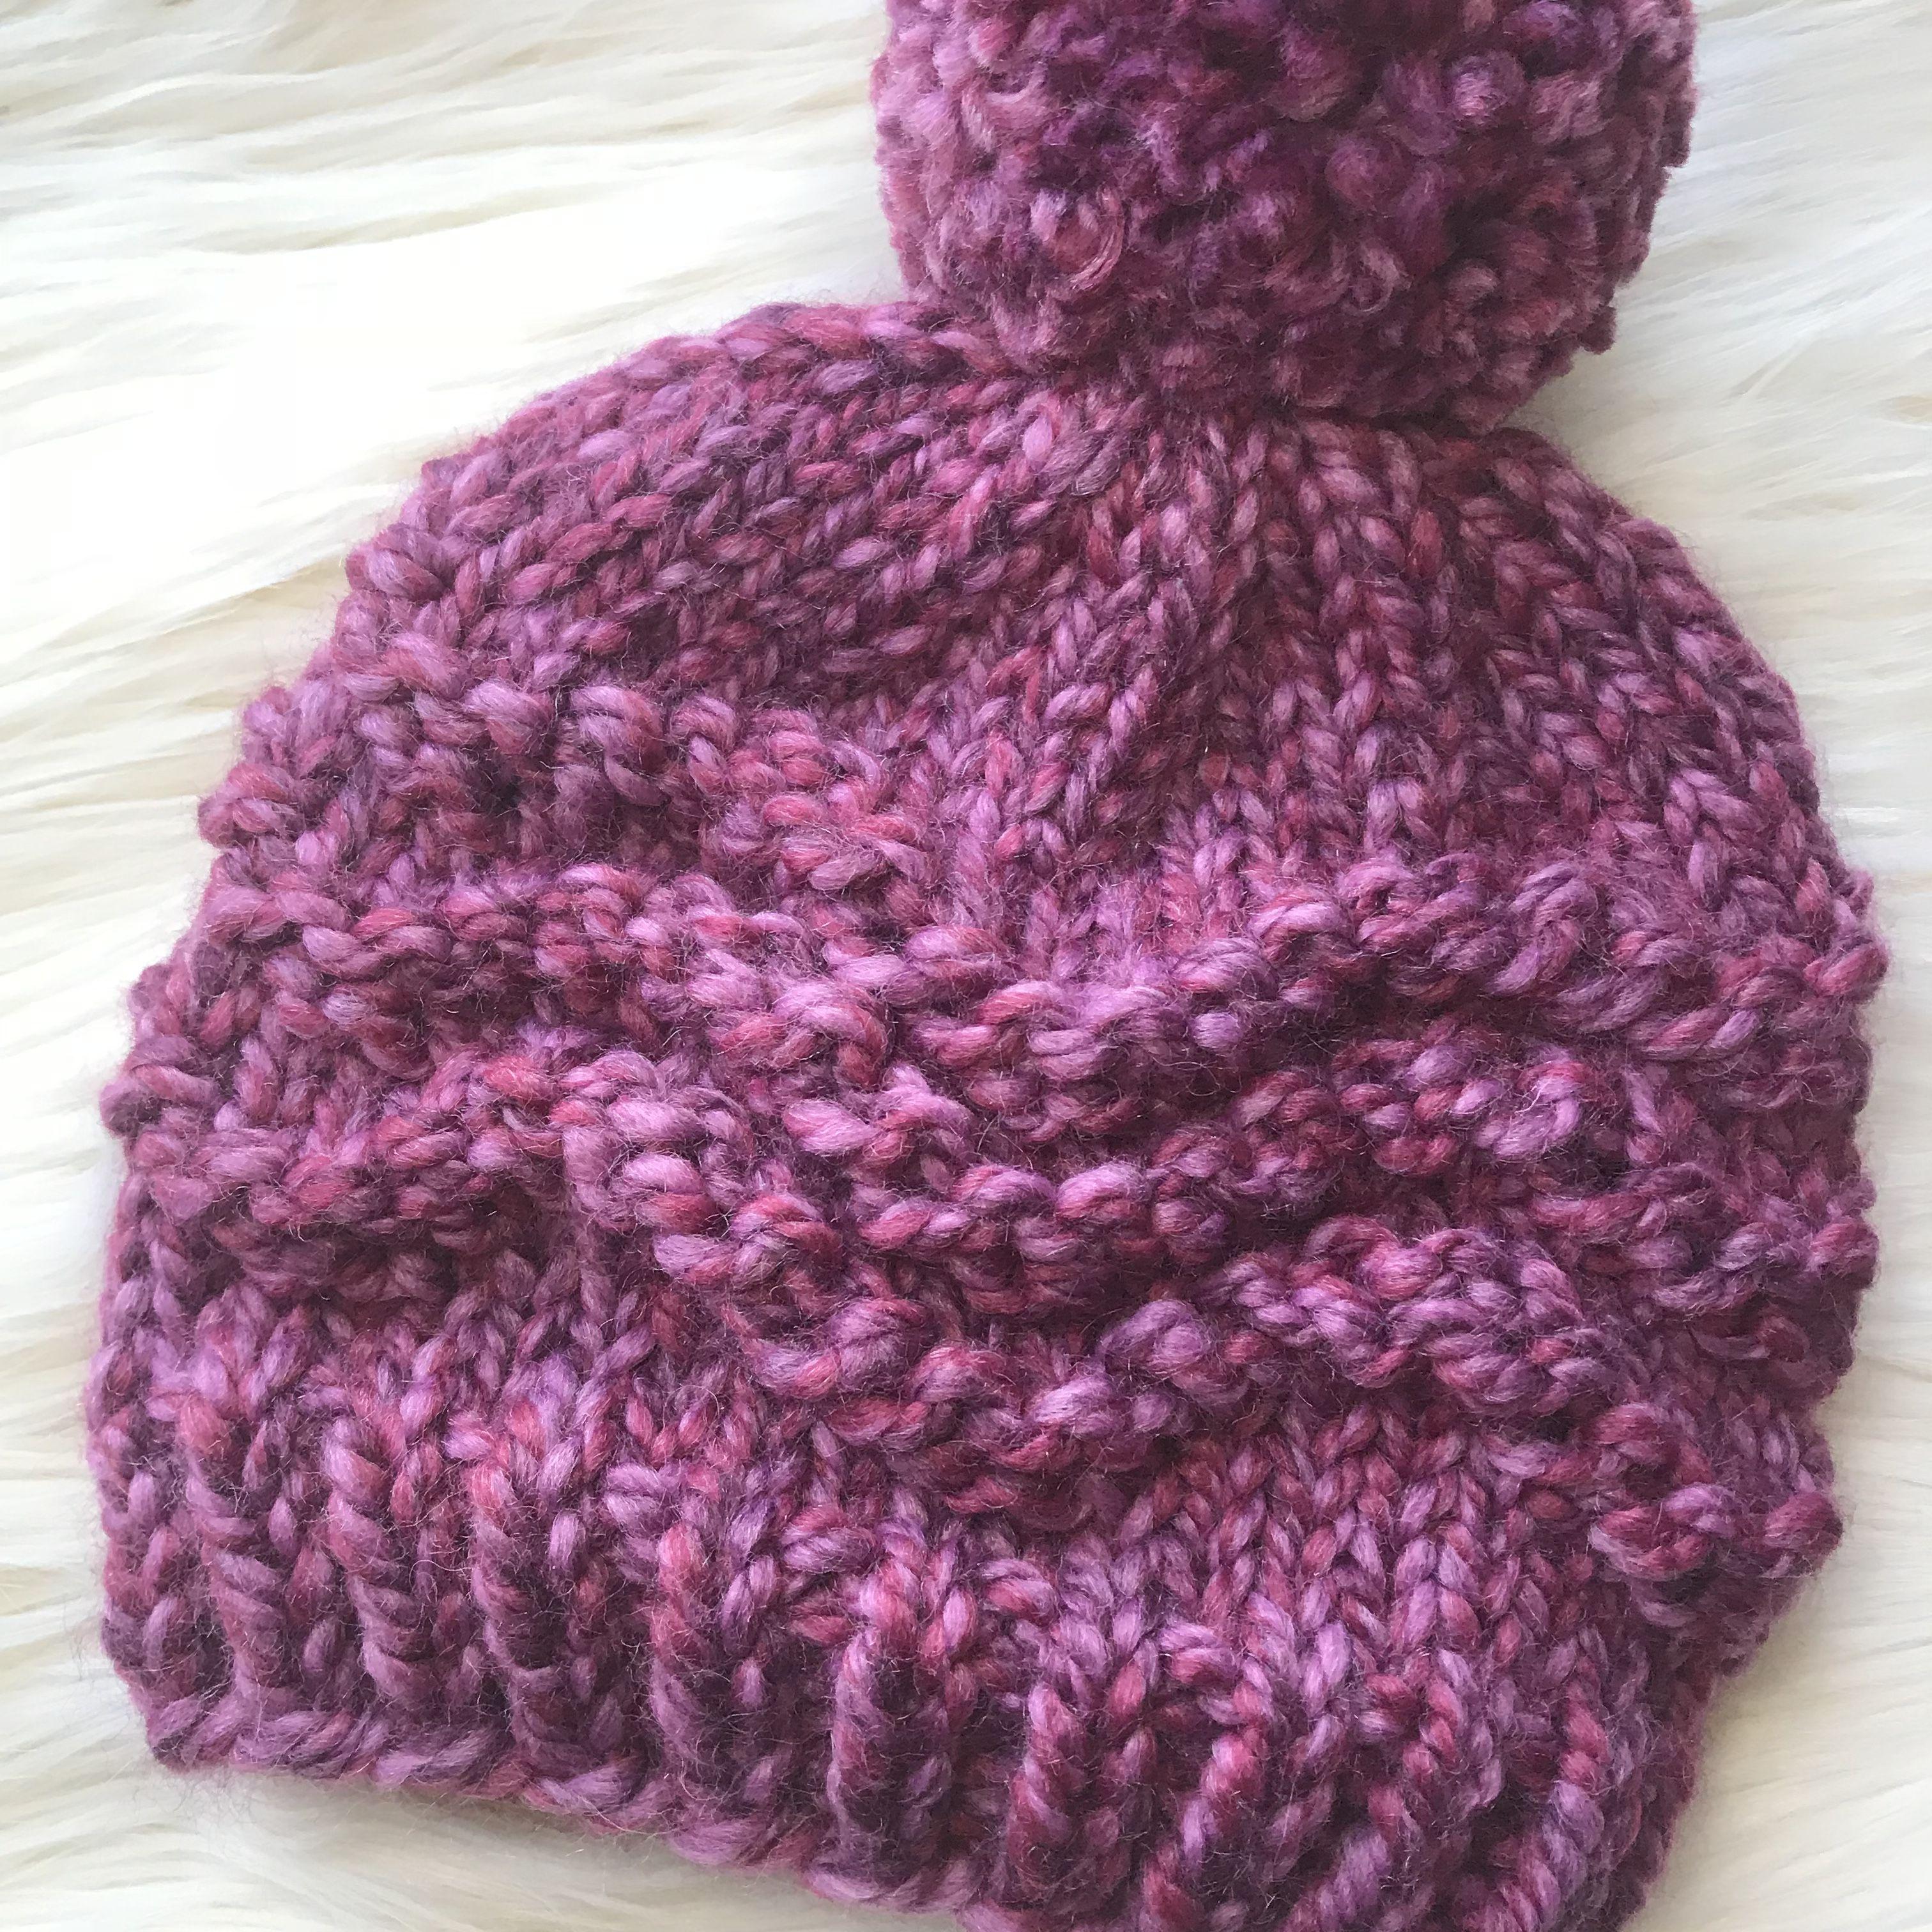 Zig Zag Chunky Beanie | Chunky knitting patterns, Knit ...